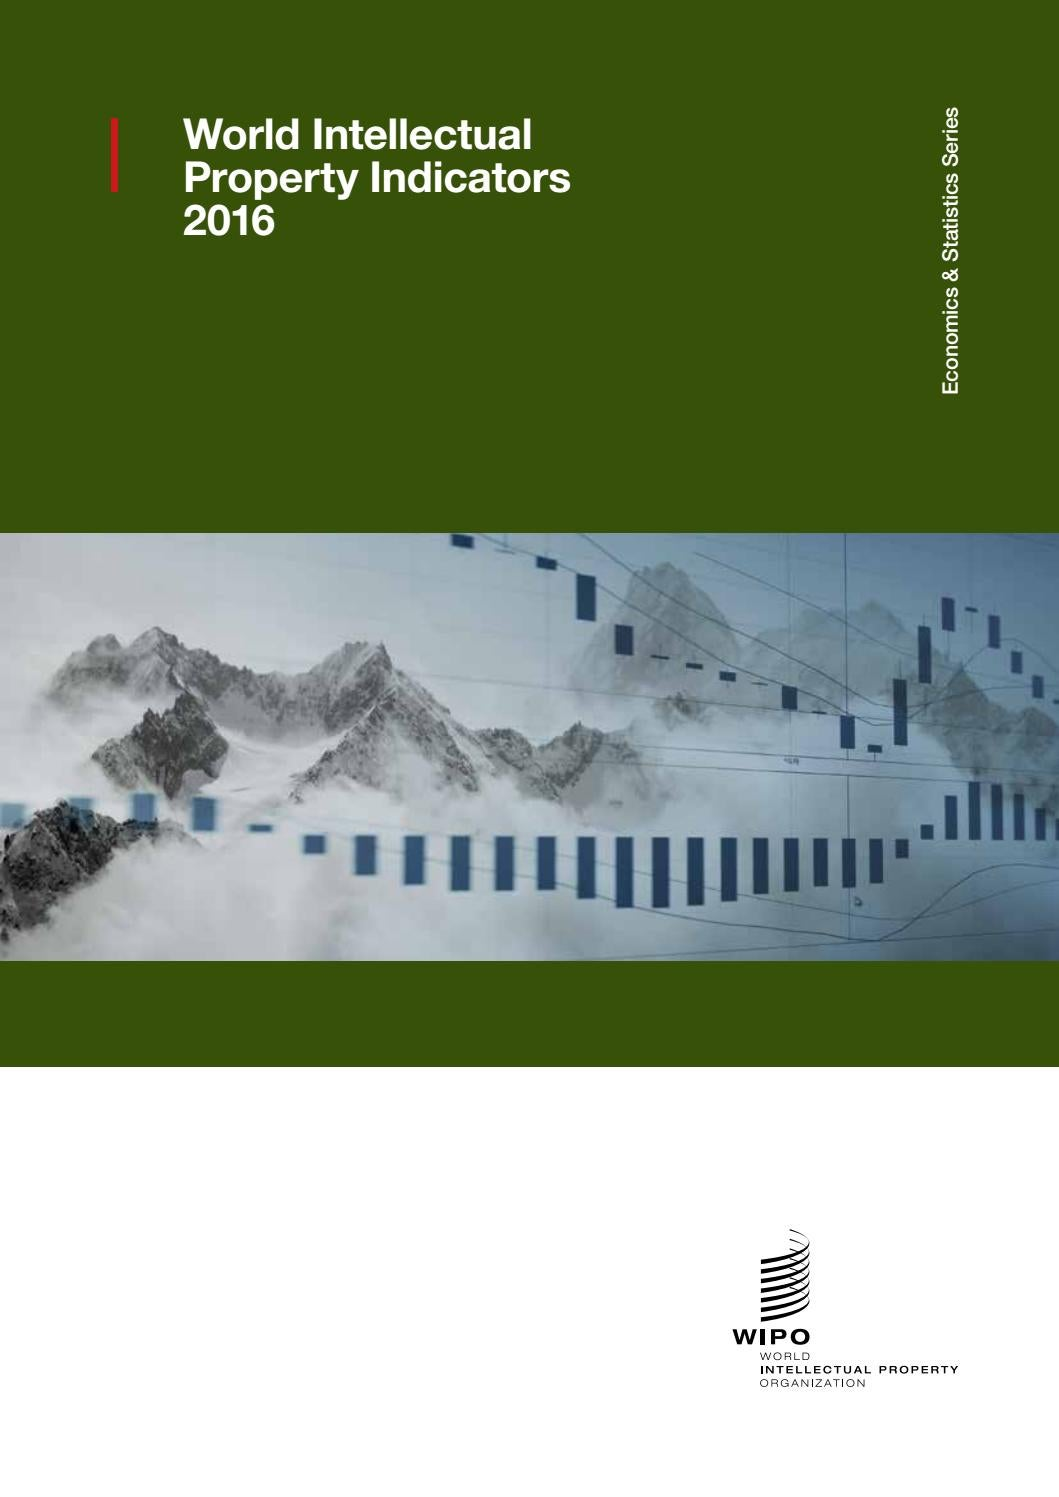 World Intellectual Property Indicators by Observatorio Diasporas - issuu